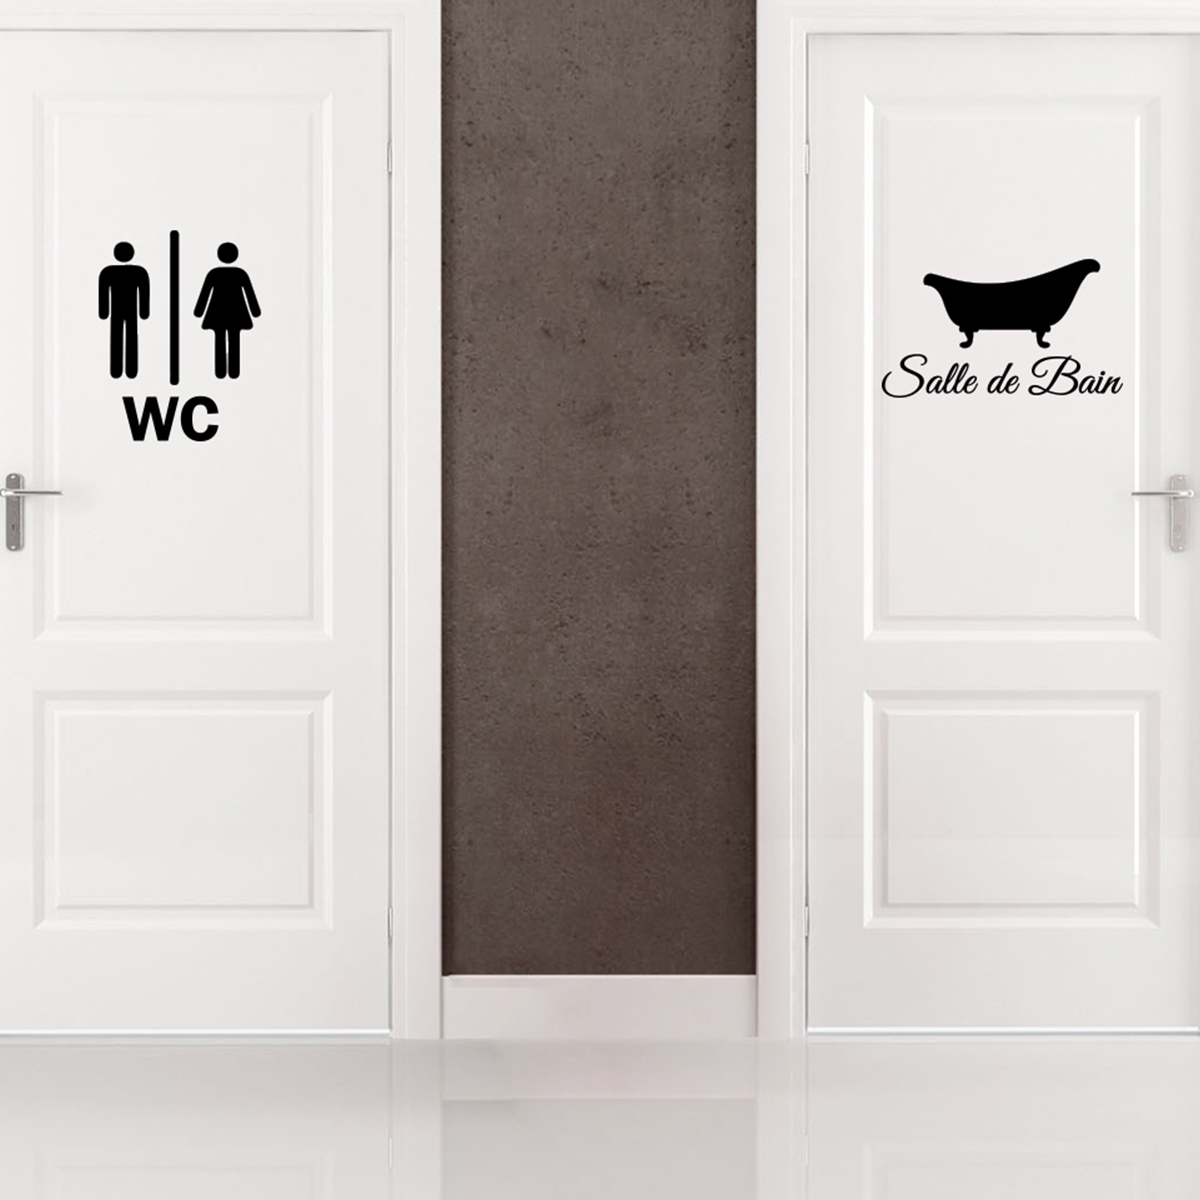 Sticker Porte Salle De Bain Et WC Stickers SALLE DE BAIN